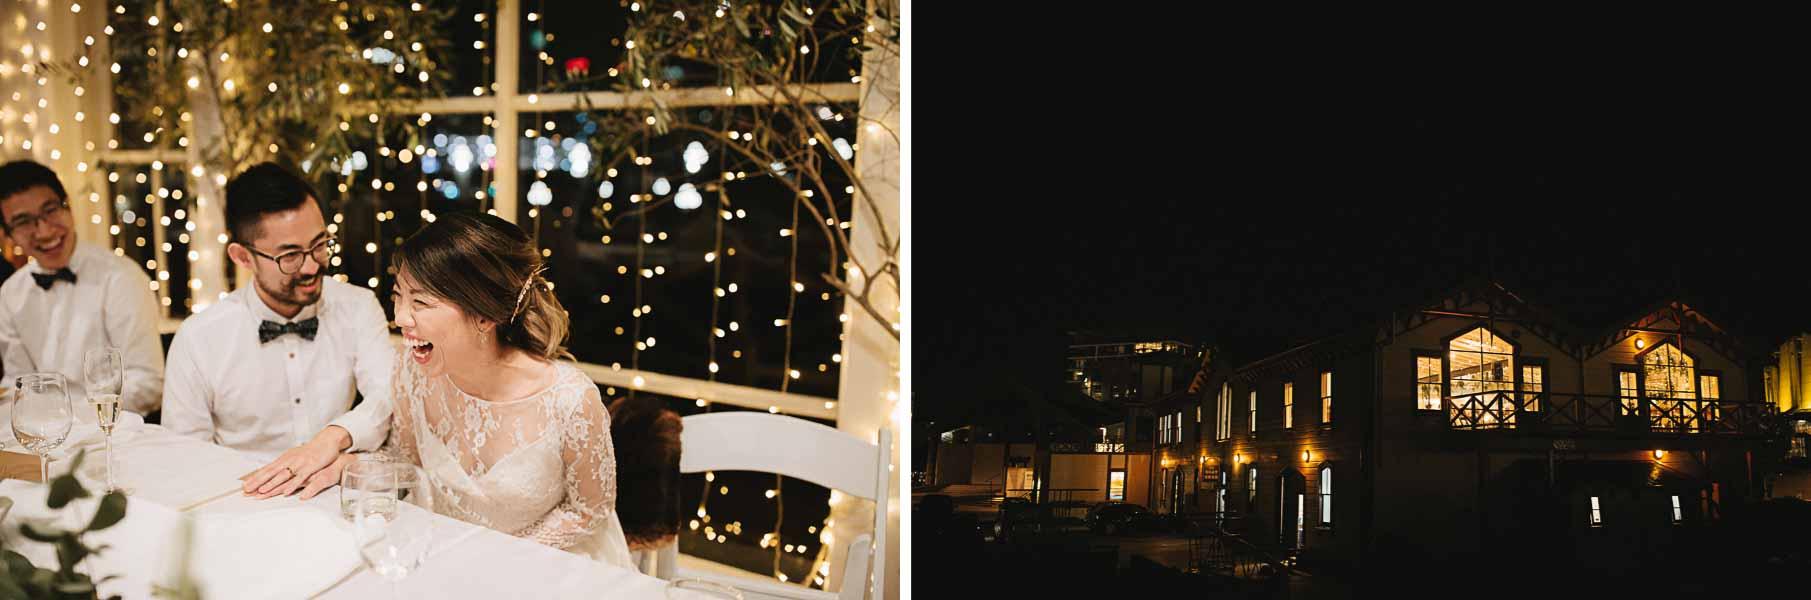 The Boatshed Wellington Wedding venue.jpg